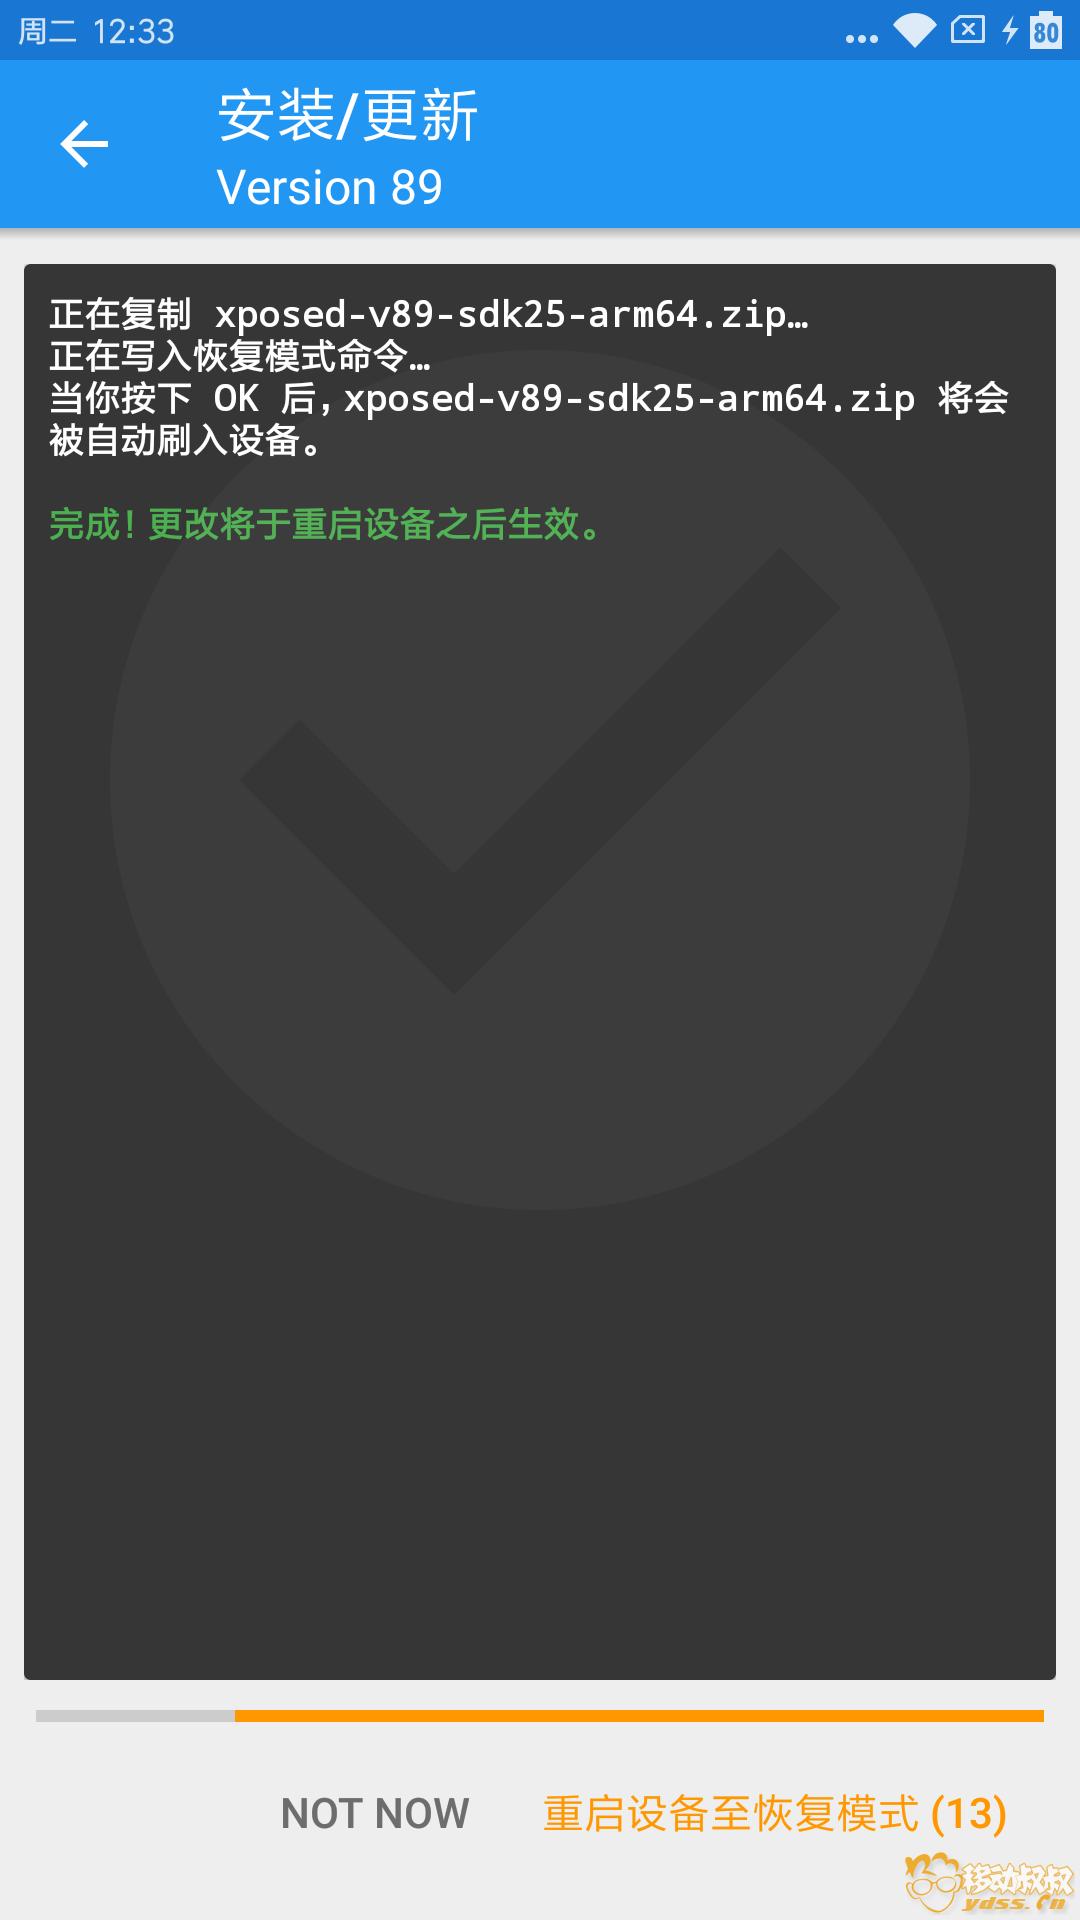 Screenshot_2018-01-16-00-33-11-489_de.robv.android.xposed.installer.png